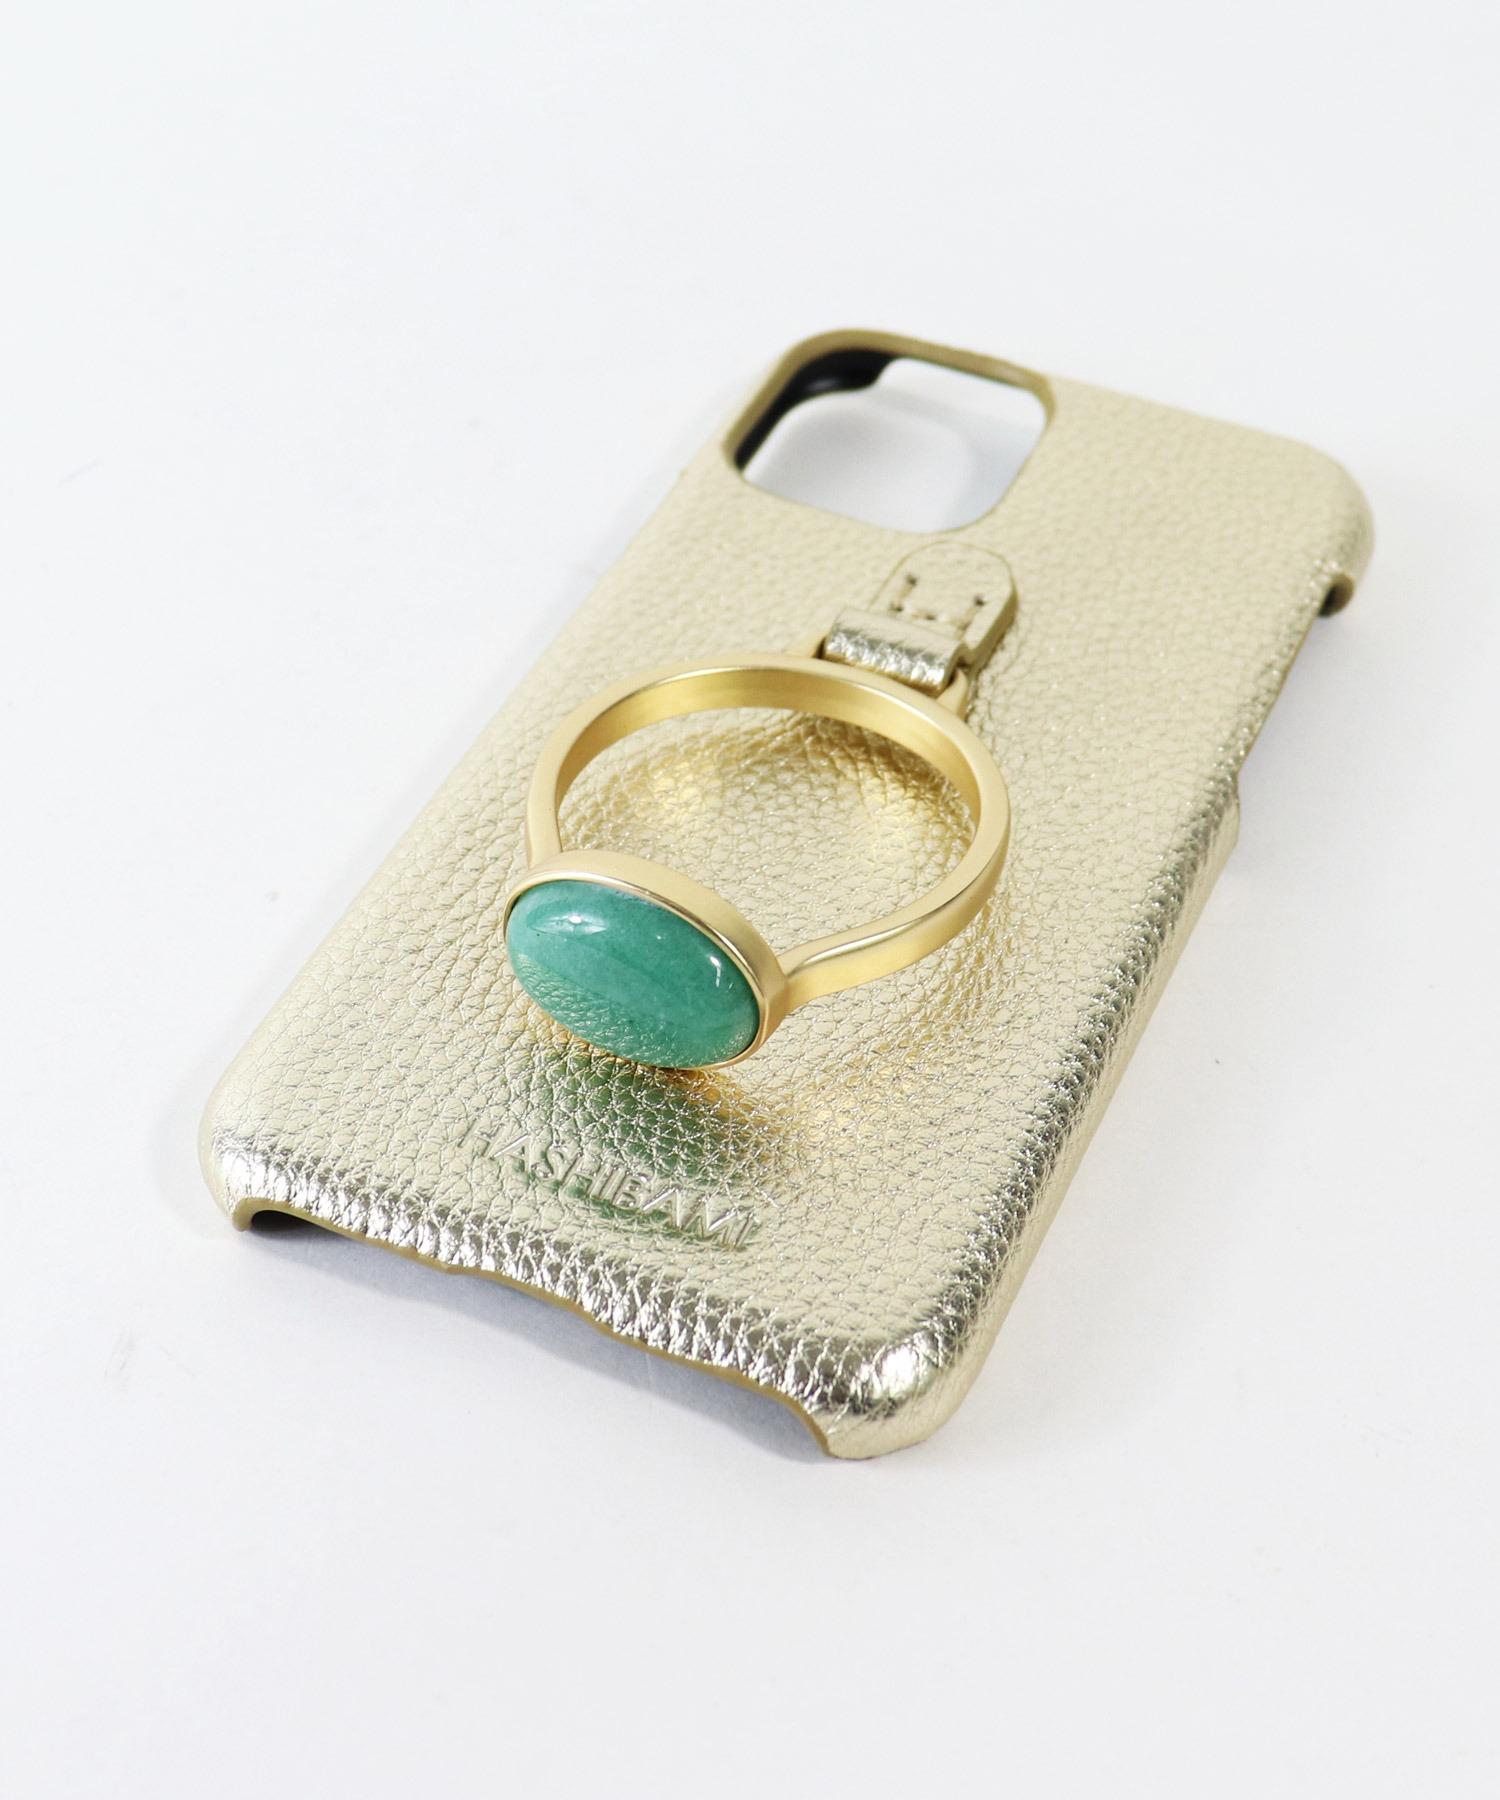 【 Hashibami / ハシバミ 】  iPhone 11/XR スマホ・携帯カバー 天然石リング付きケース